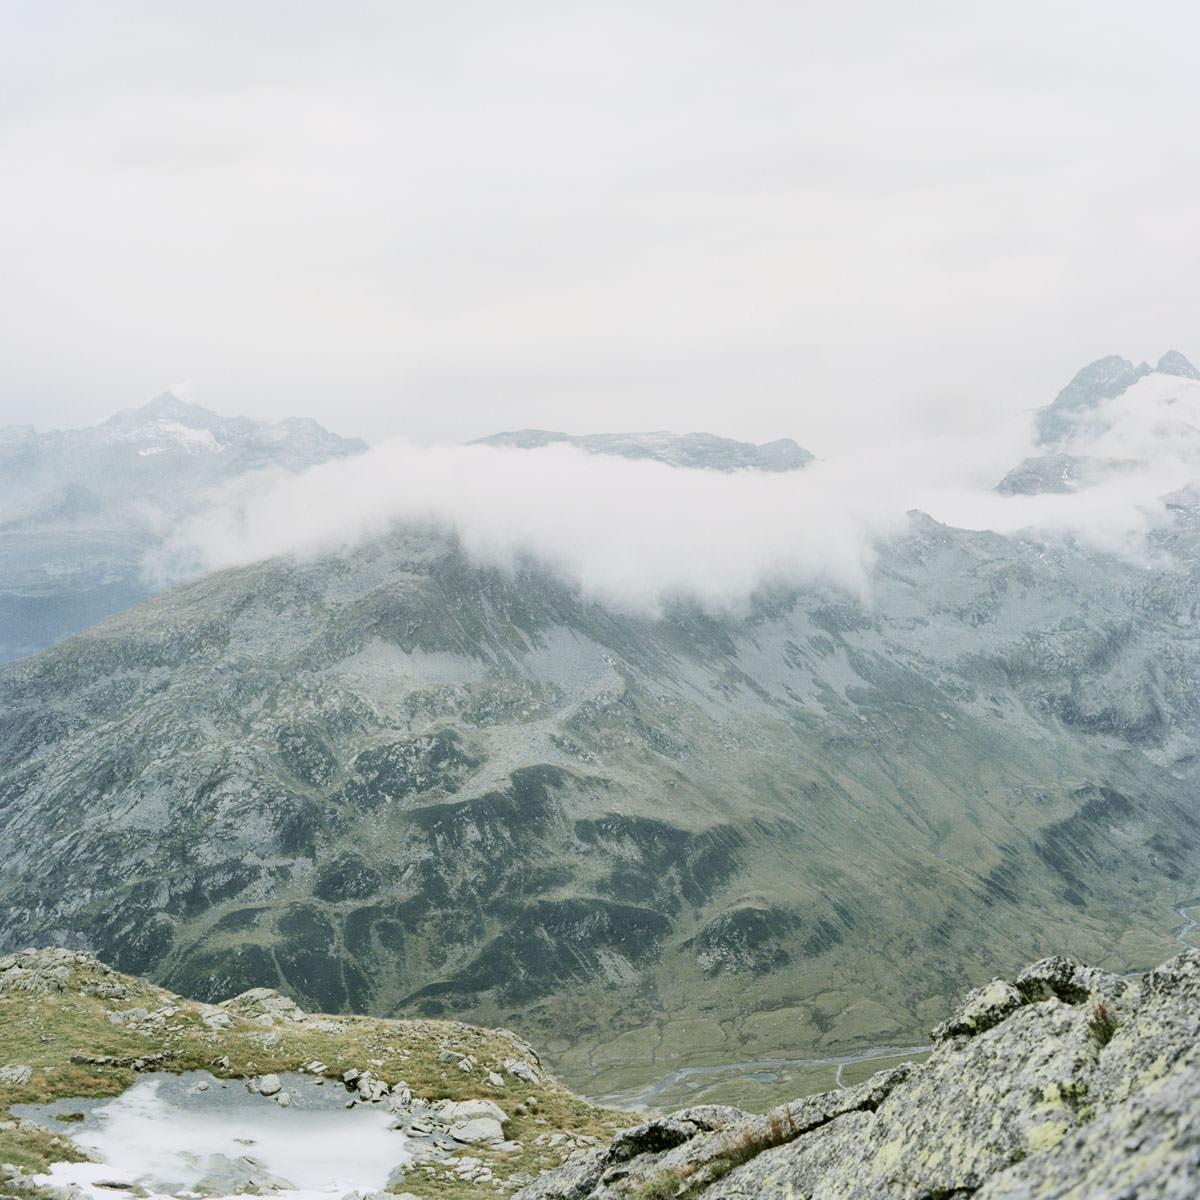 splügen pass berge nebel wandern gipfel horizont see bergsee landschaft italien jörn strojny